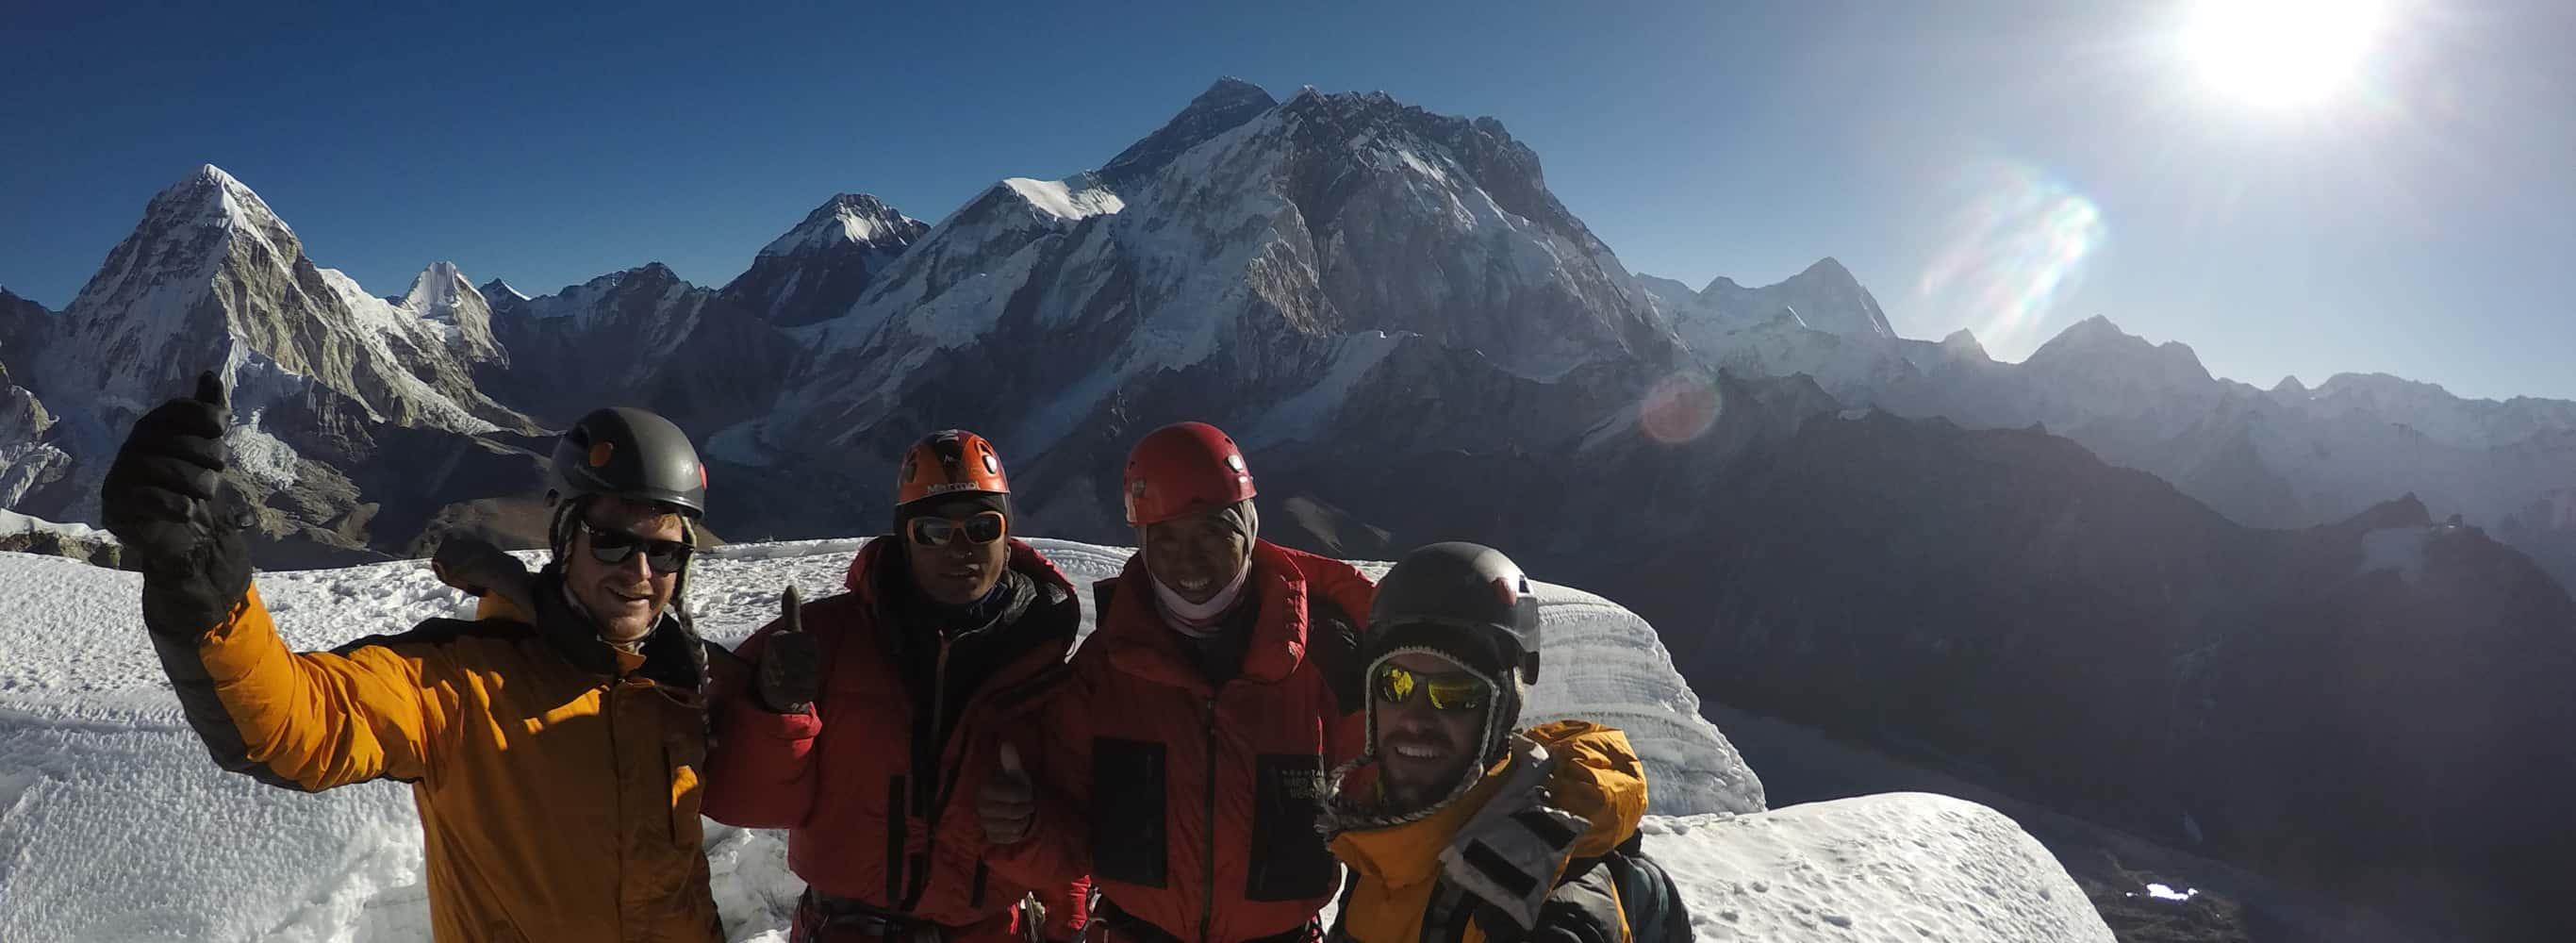 Three Peaks Climbing - Pokalde, The Island and Lobuche East - 23 Days